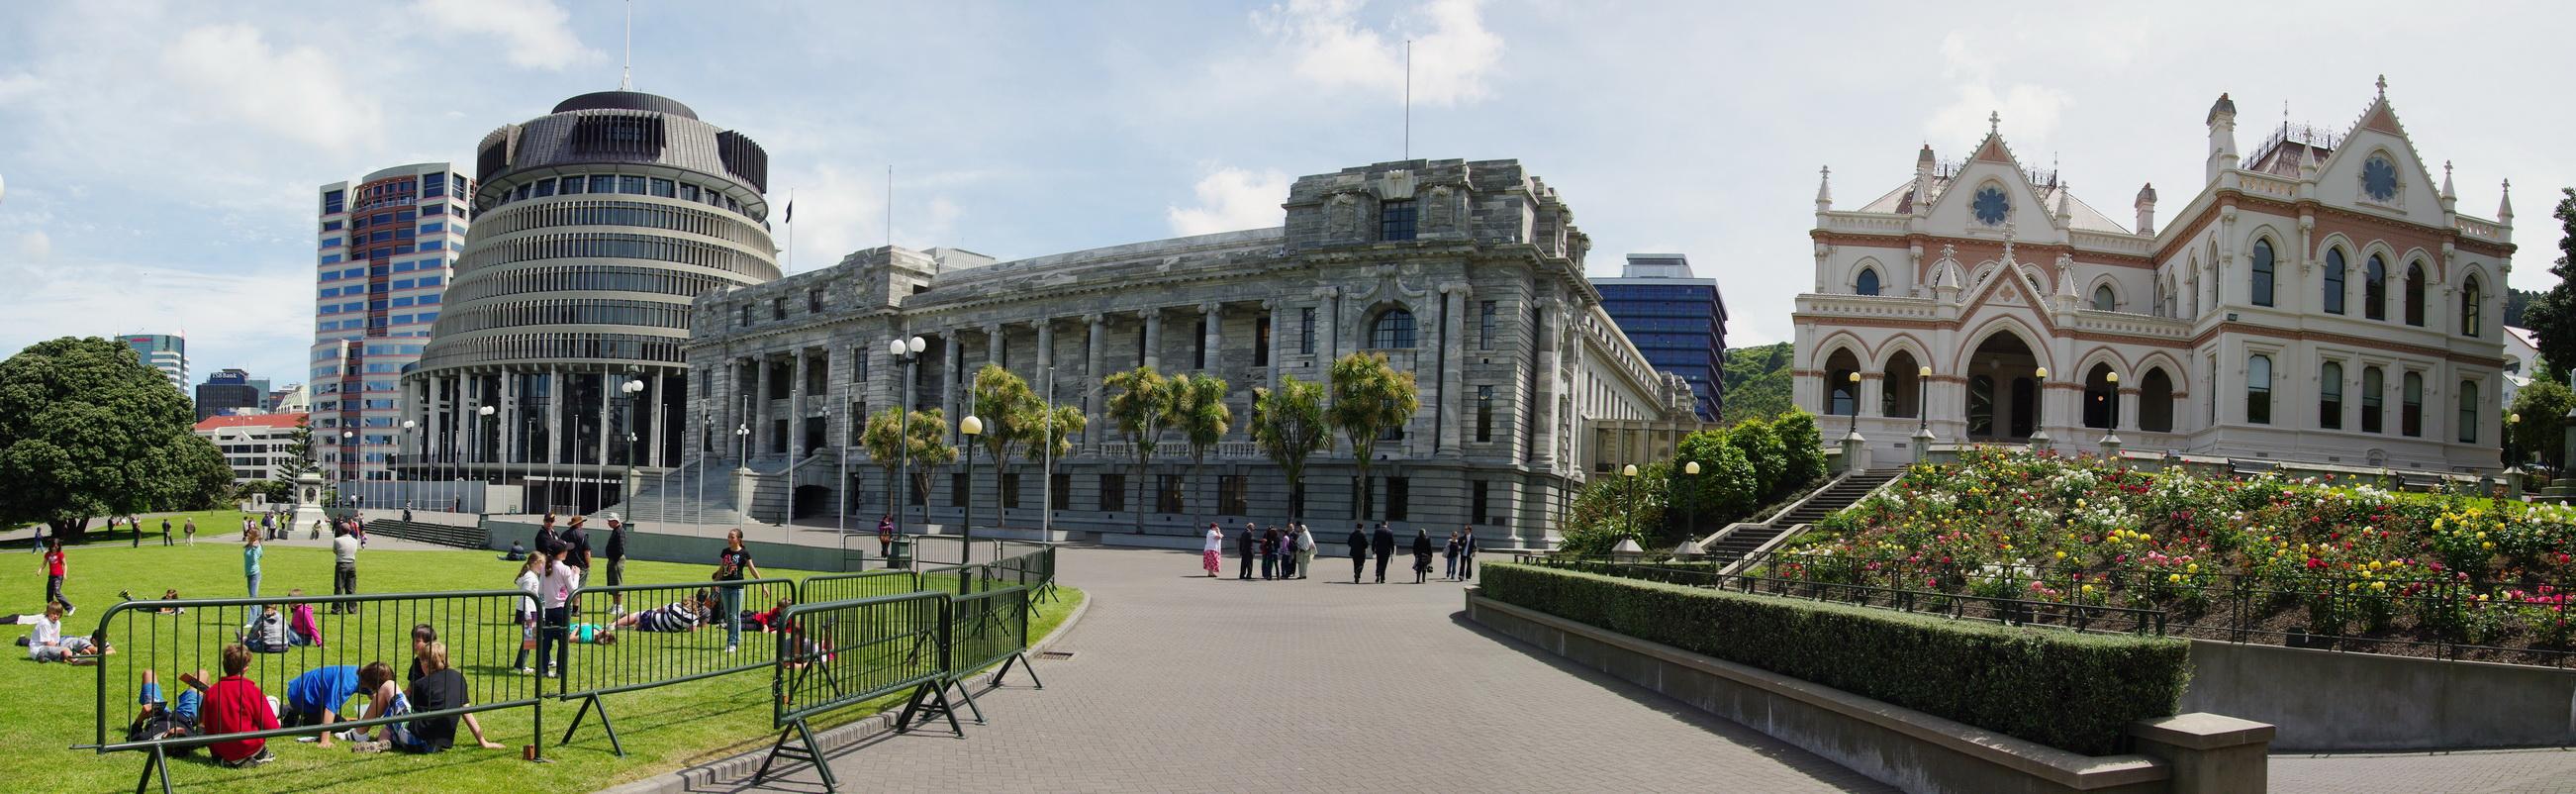 紐西蘭 | 威靈頓 Wellington | New Zealand Parliament Buildings